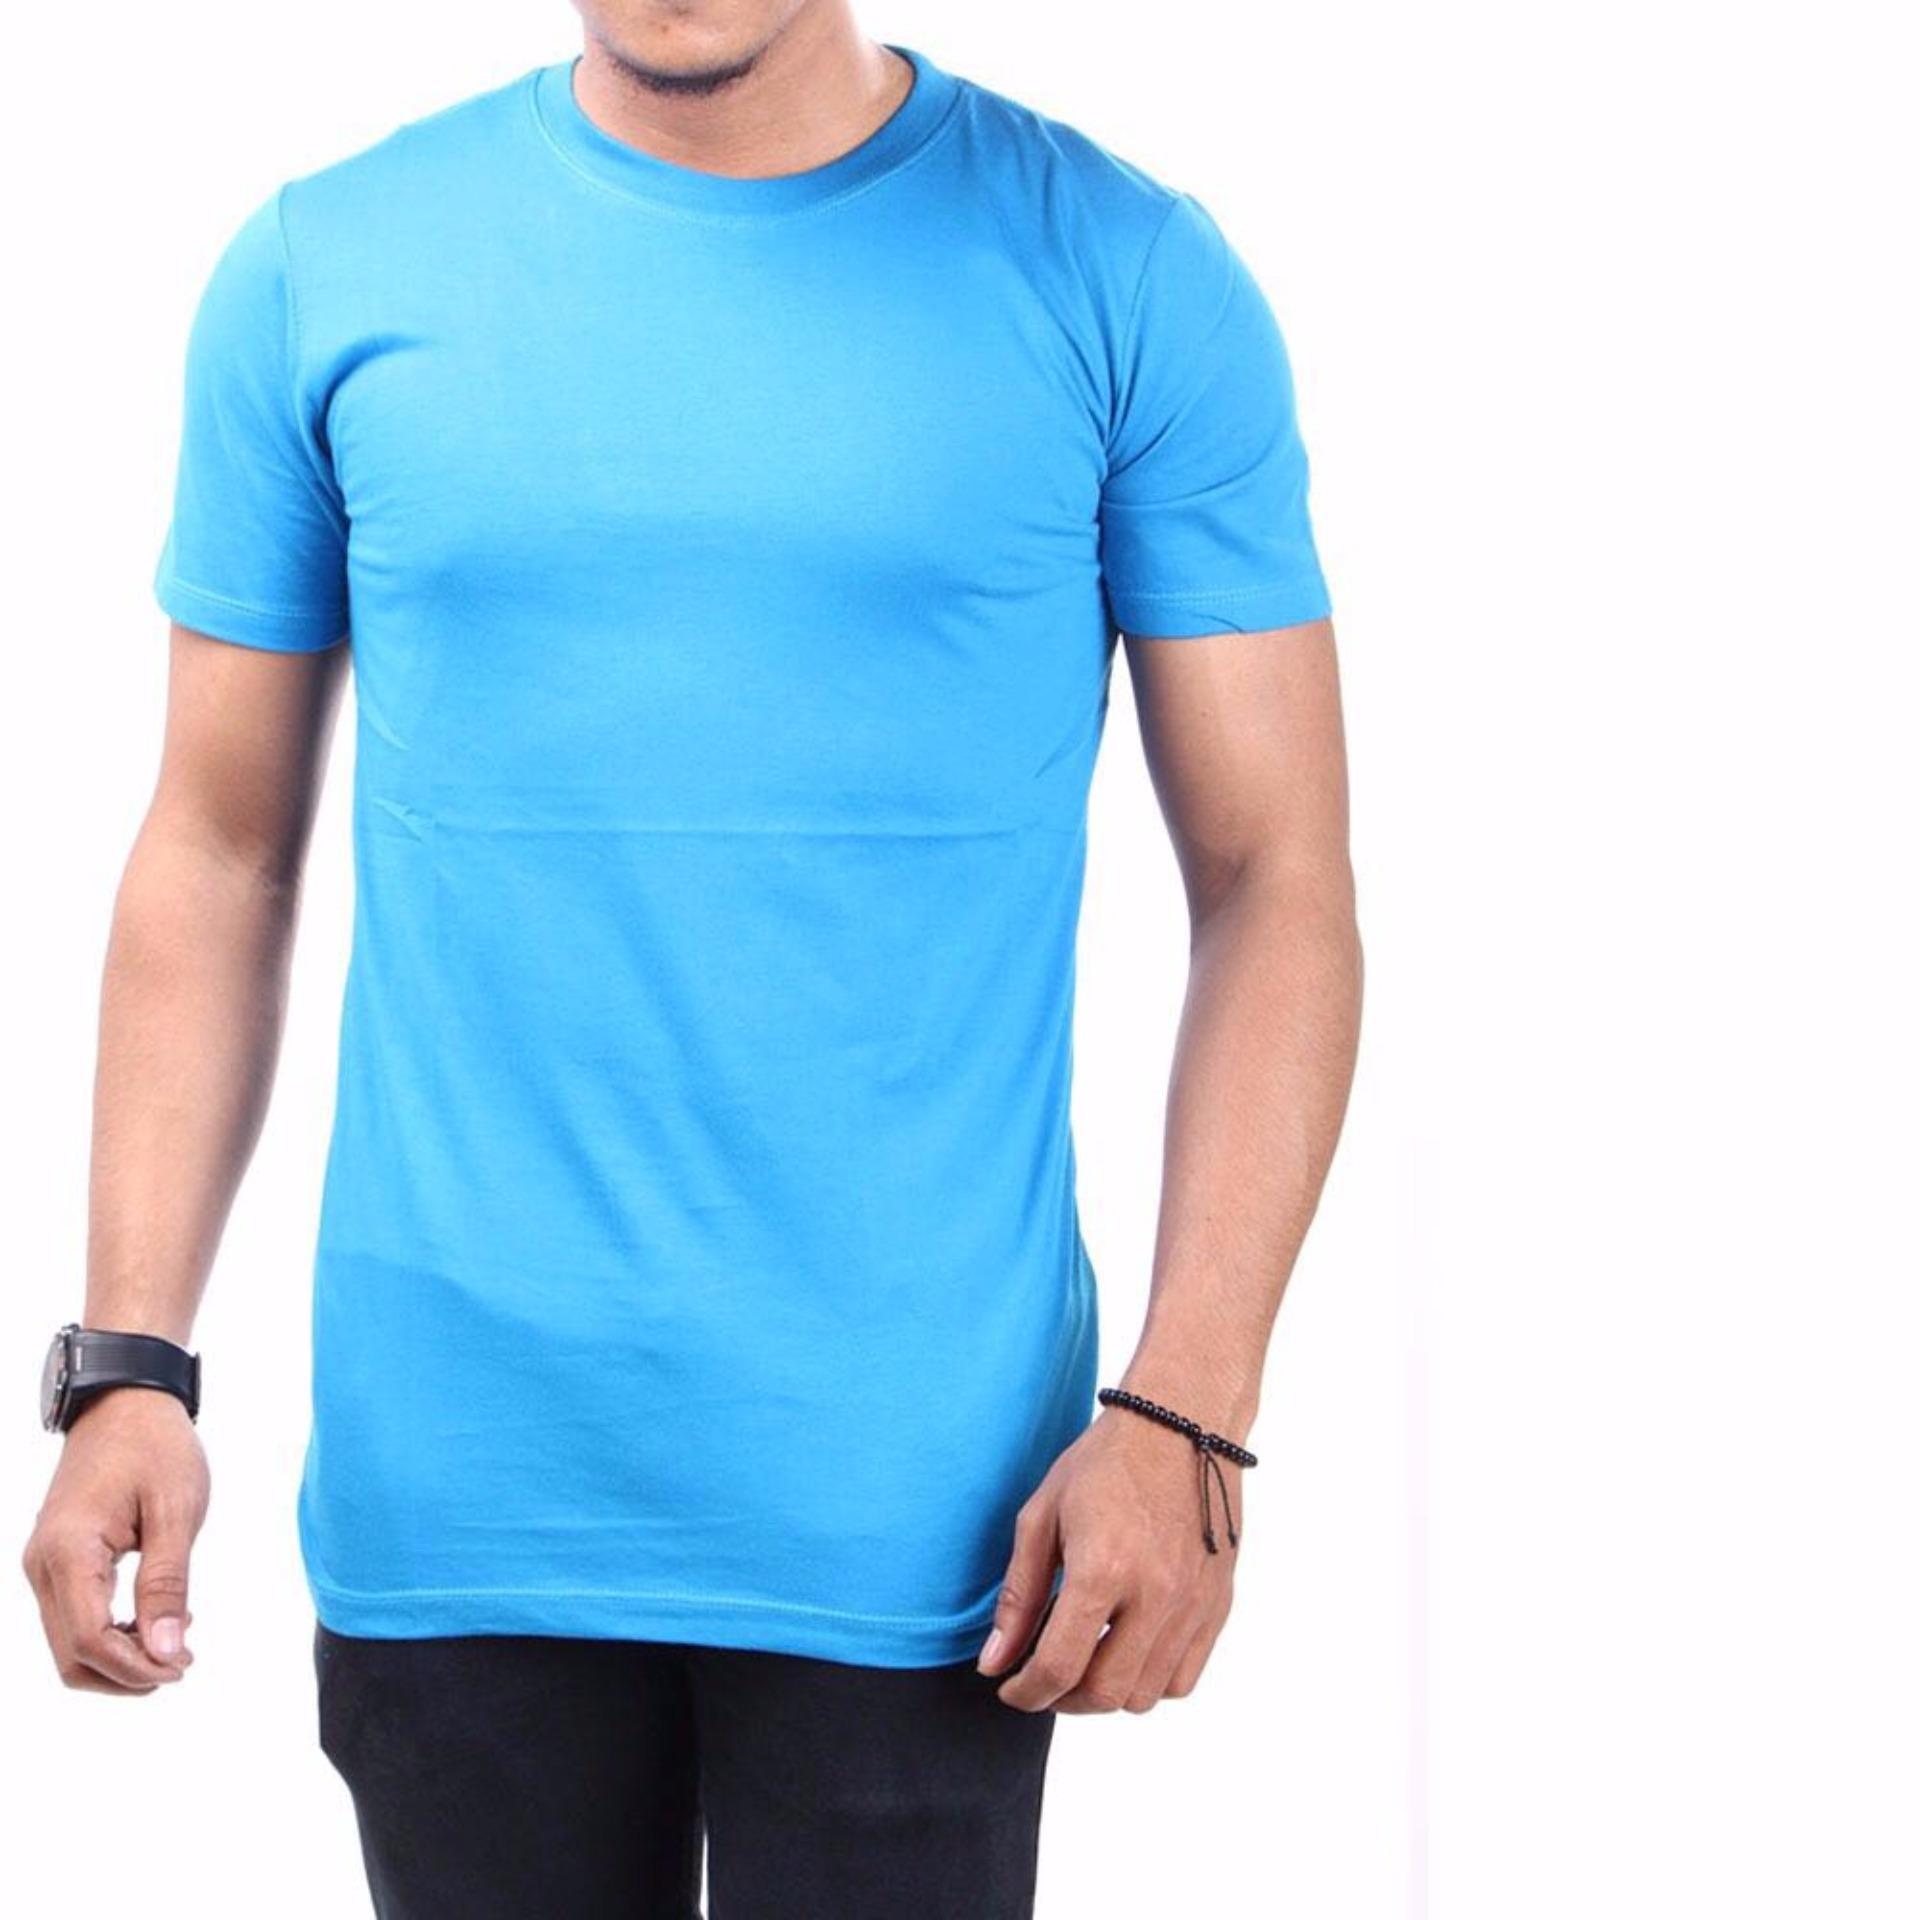 Irfan Store95 - Kaos Pendak O Neck - Biru